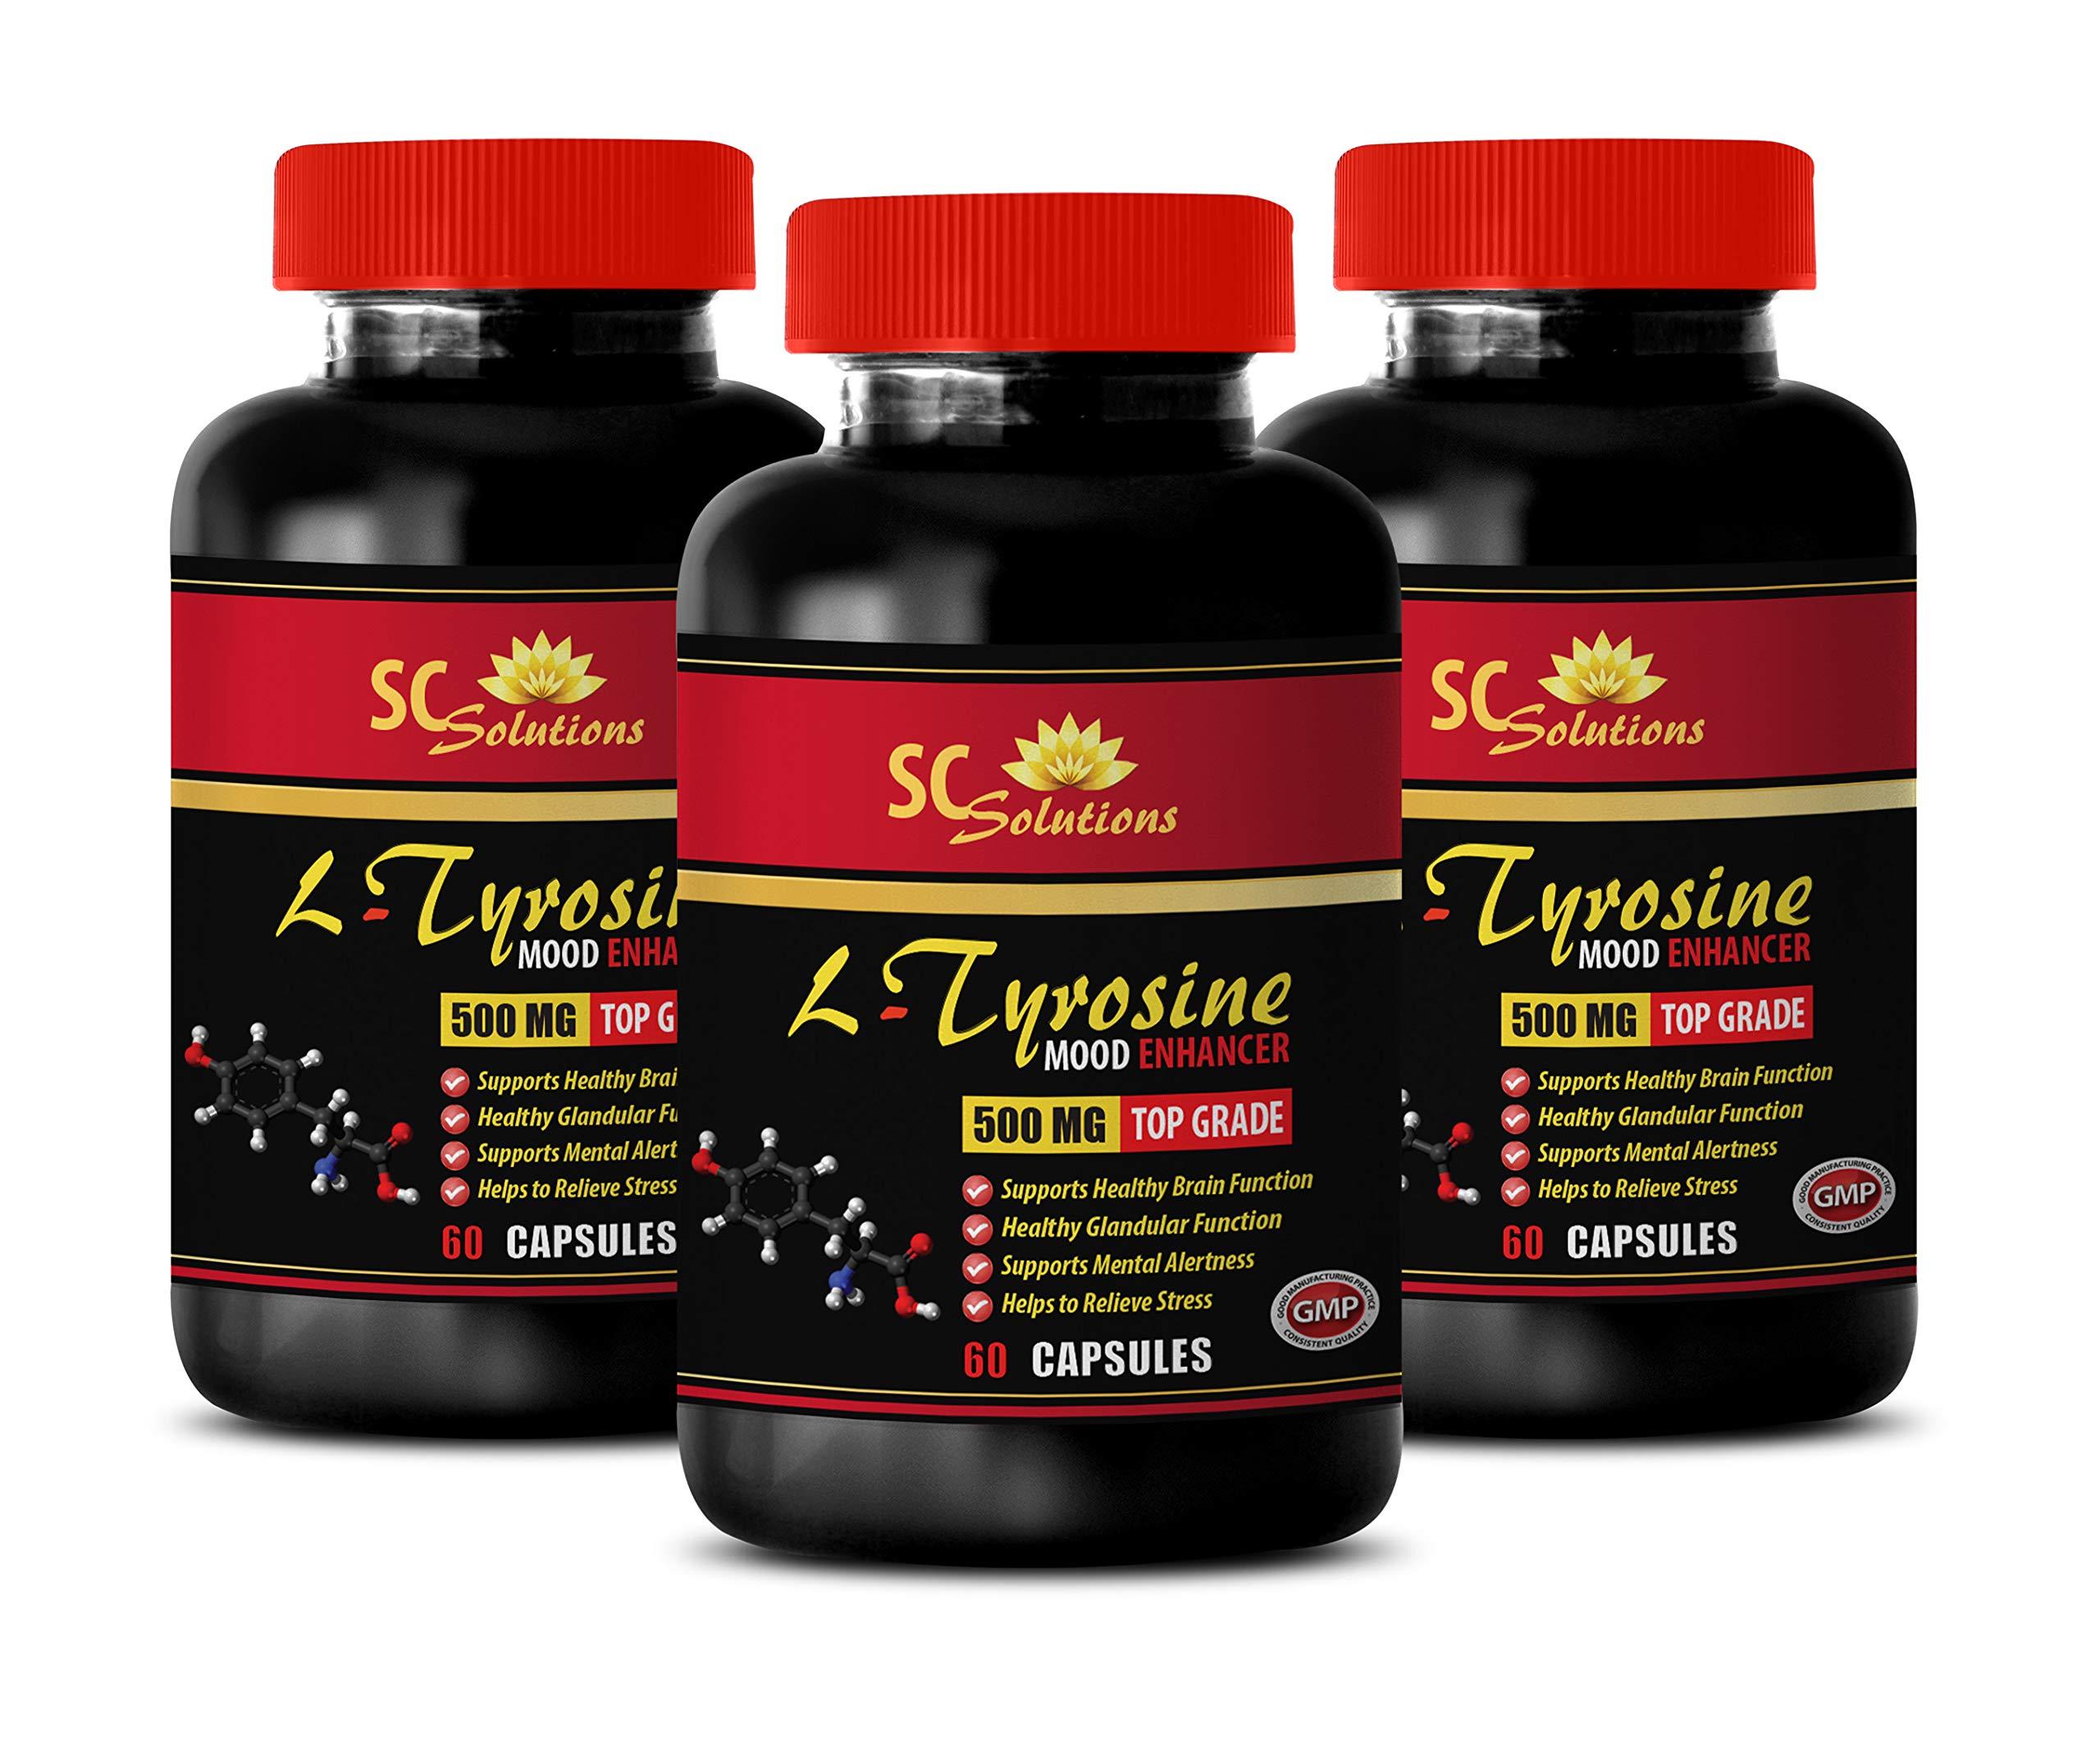 Blood Pressure Optimizer Supplement - L TYROSINE 500MG - Mood Enhancer - Brain Booster Focus - 3 Bottles (180 Capsules) by SKIN CARE SOLUTIONS